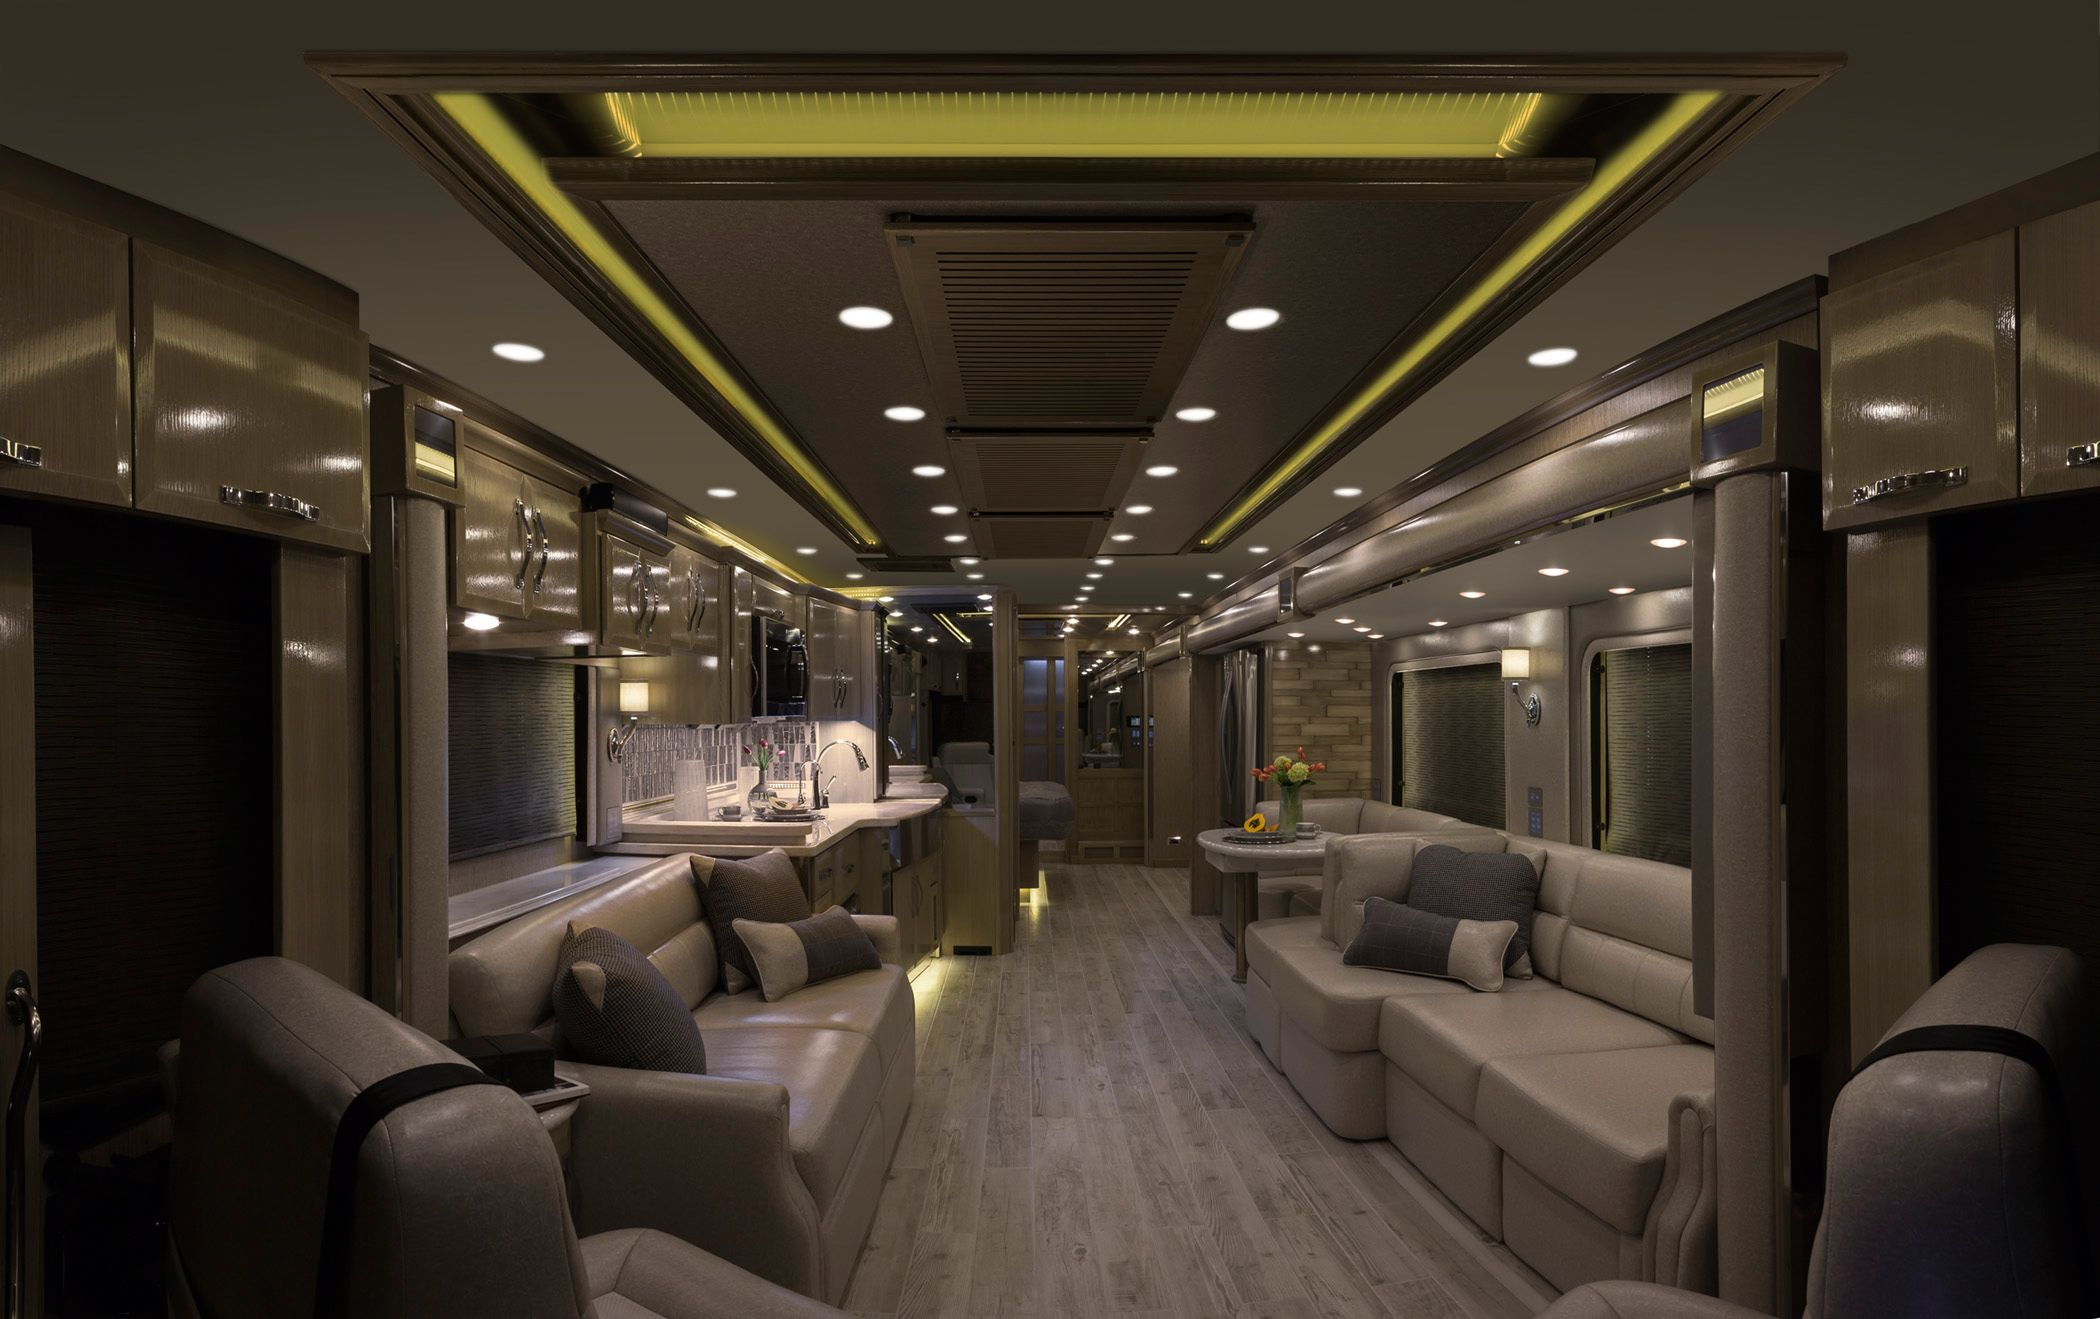 King Aire Motor Coach Gallery Newmar Luxury Rv Luxury Motorhomes Rv Interior